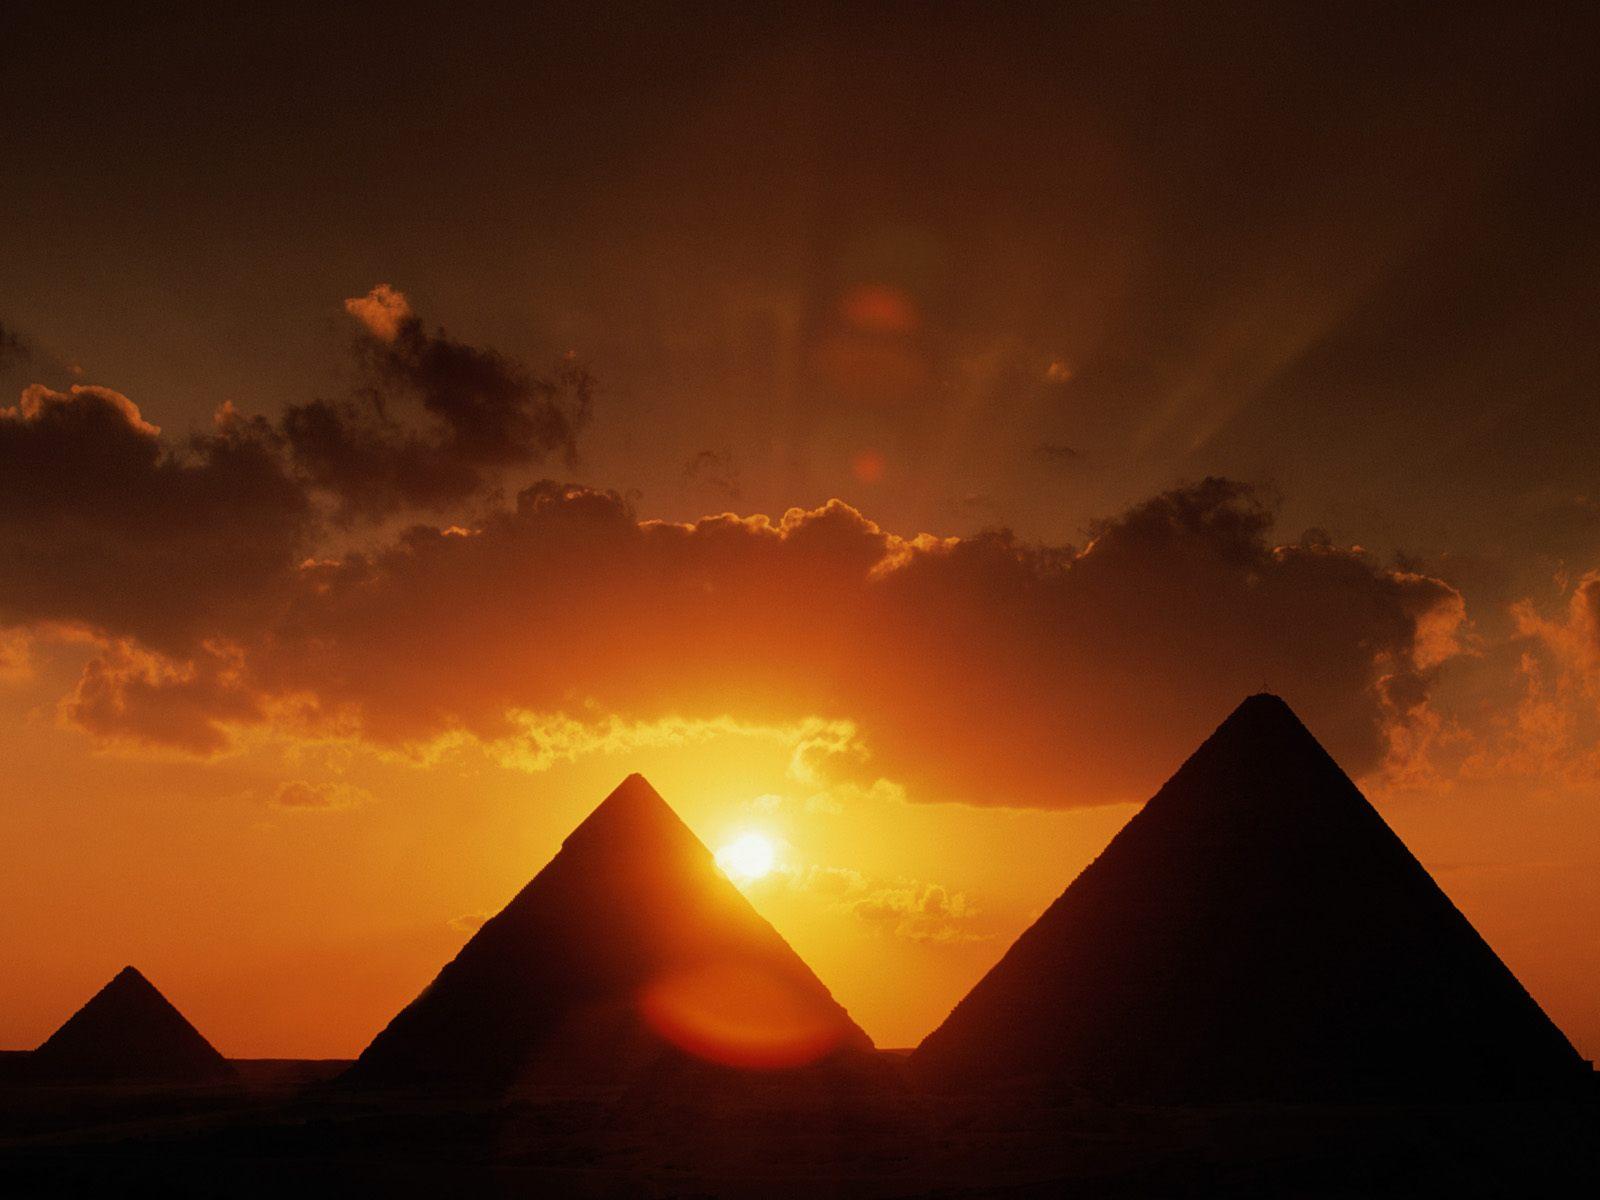 http://2.bp.blogspot.com/_sRGU_JXOz6E/TRjP2S42I6I/AAAAAAAAAs0/CvWn0ZzAMMI/s1600/piramidele-de-la-sunset-wallpapers_4602_1600%255B1%255D.jpg